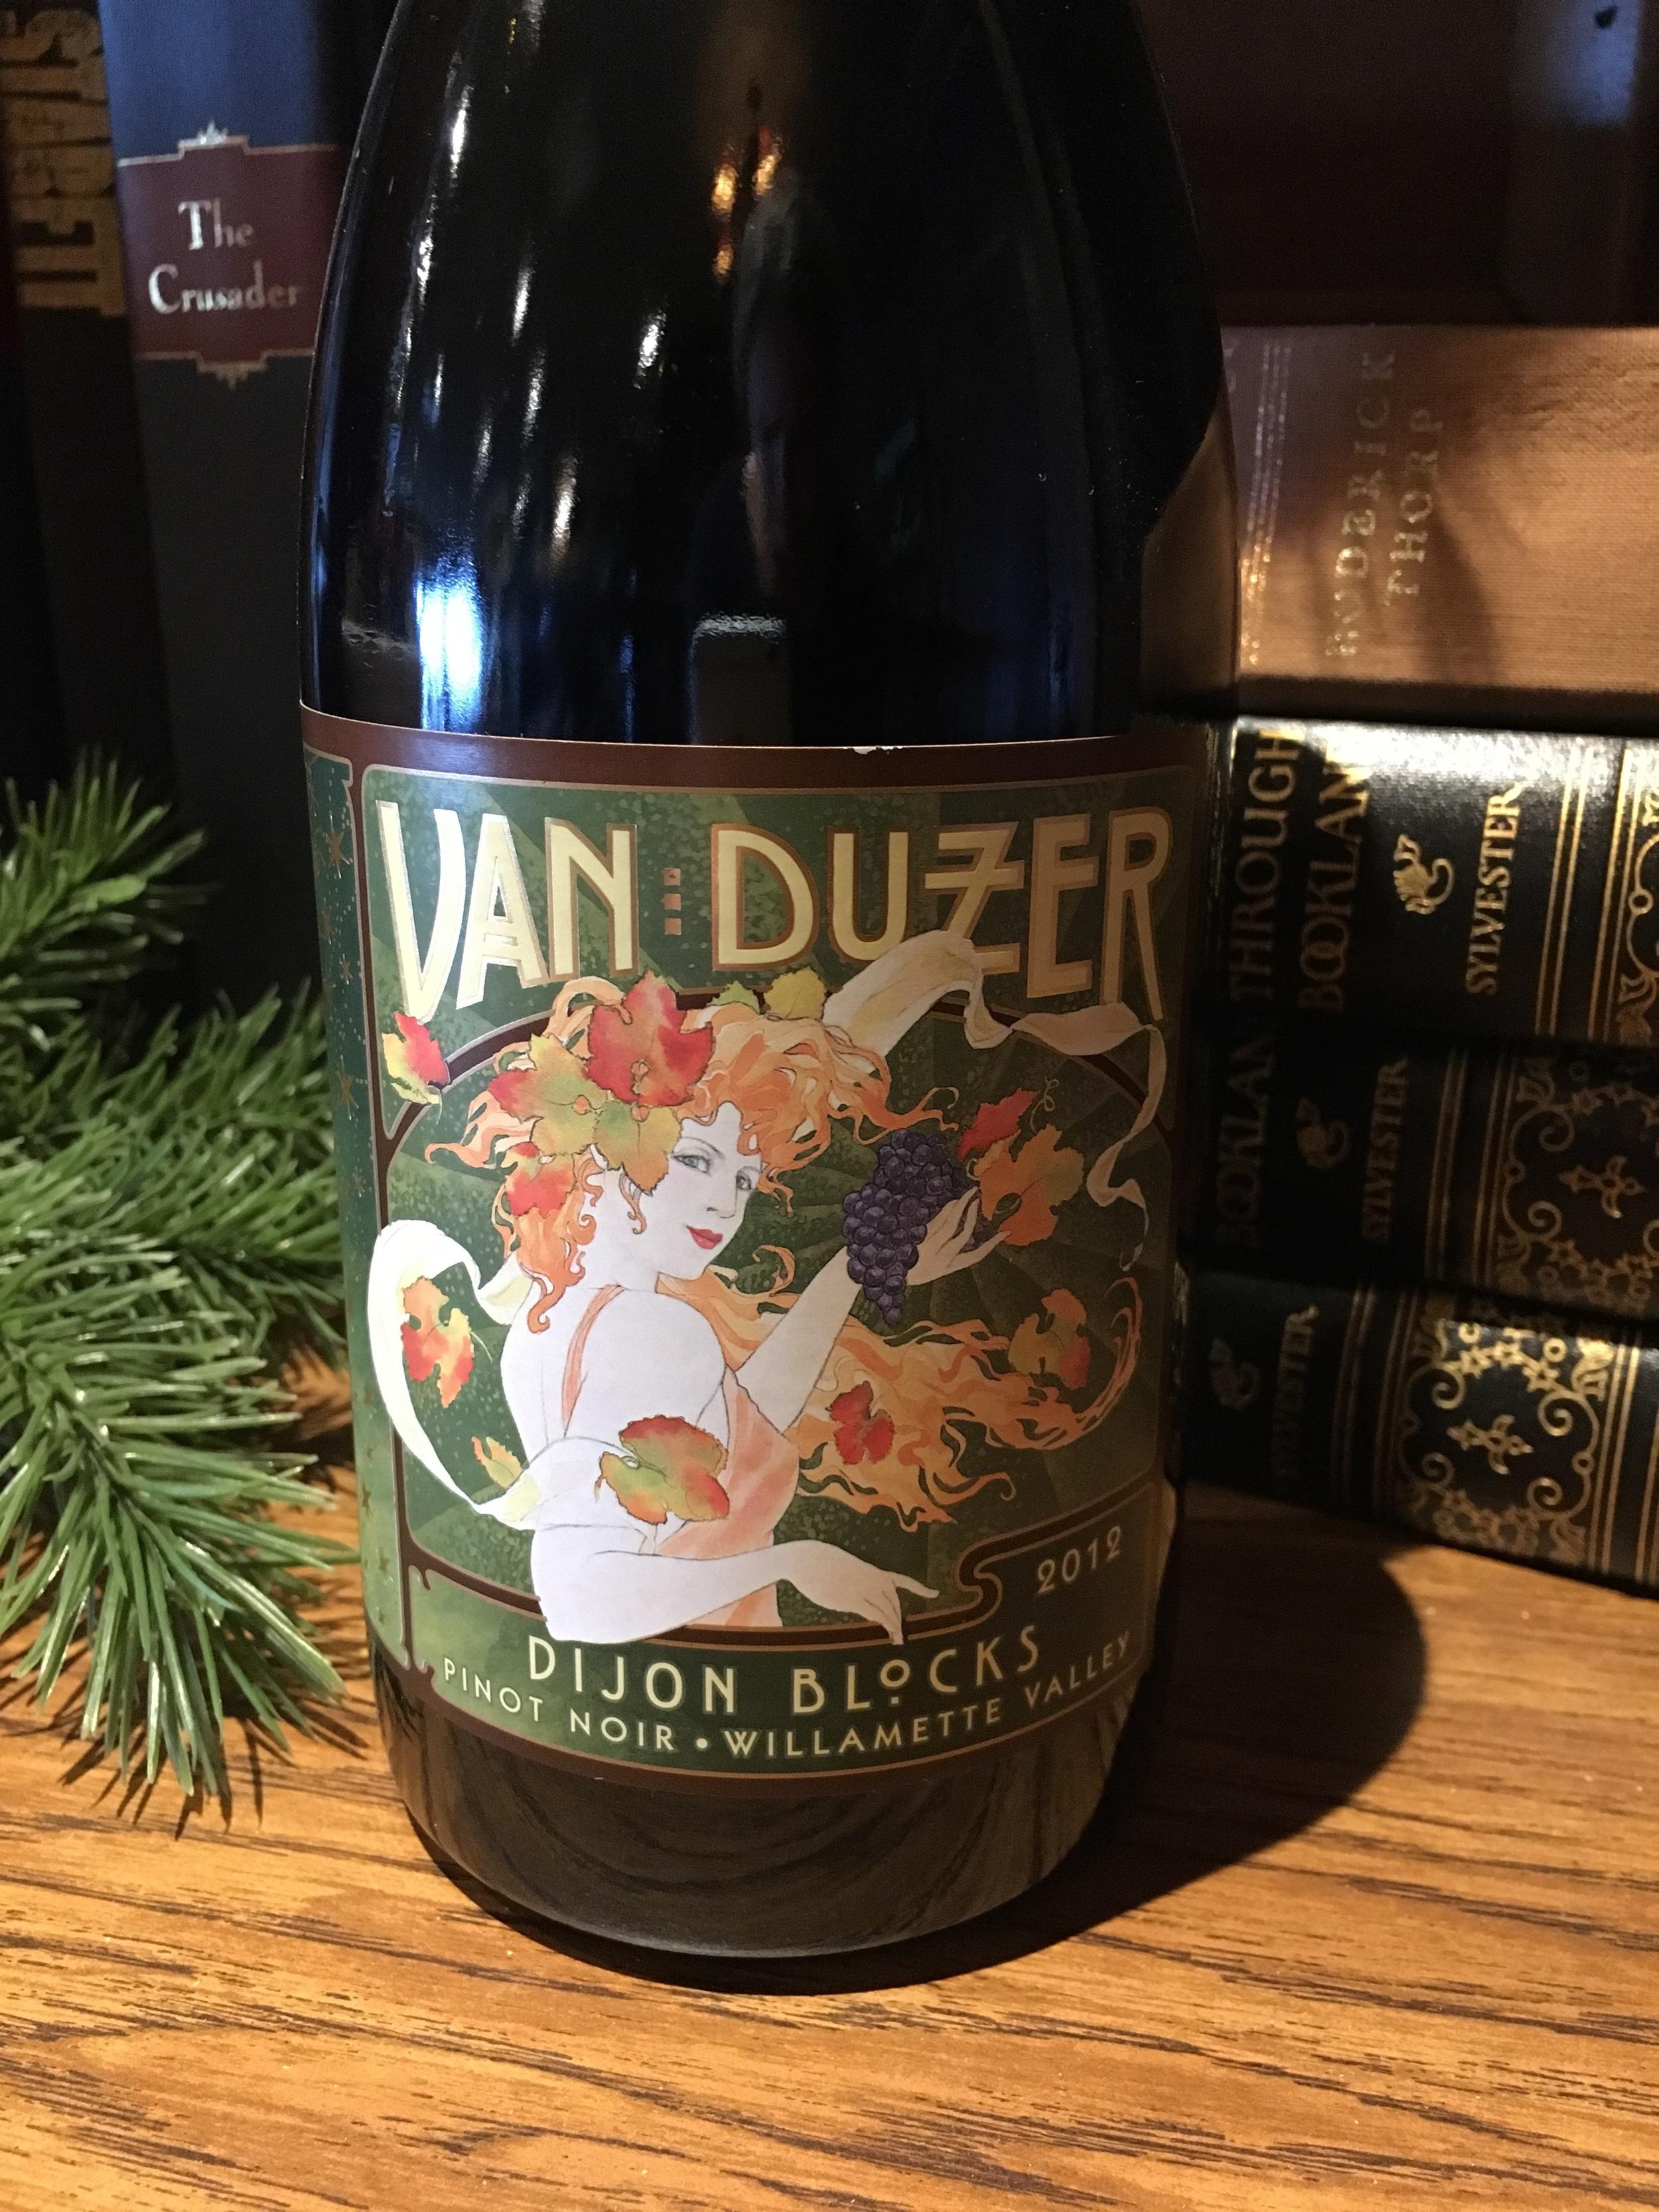 Van Duzer - 2012 Dijon Blocks Pinot Noir